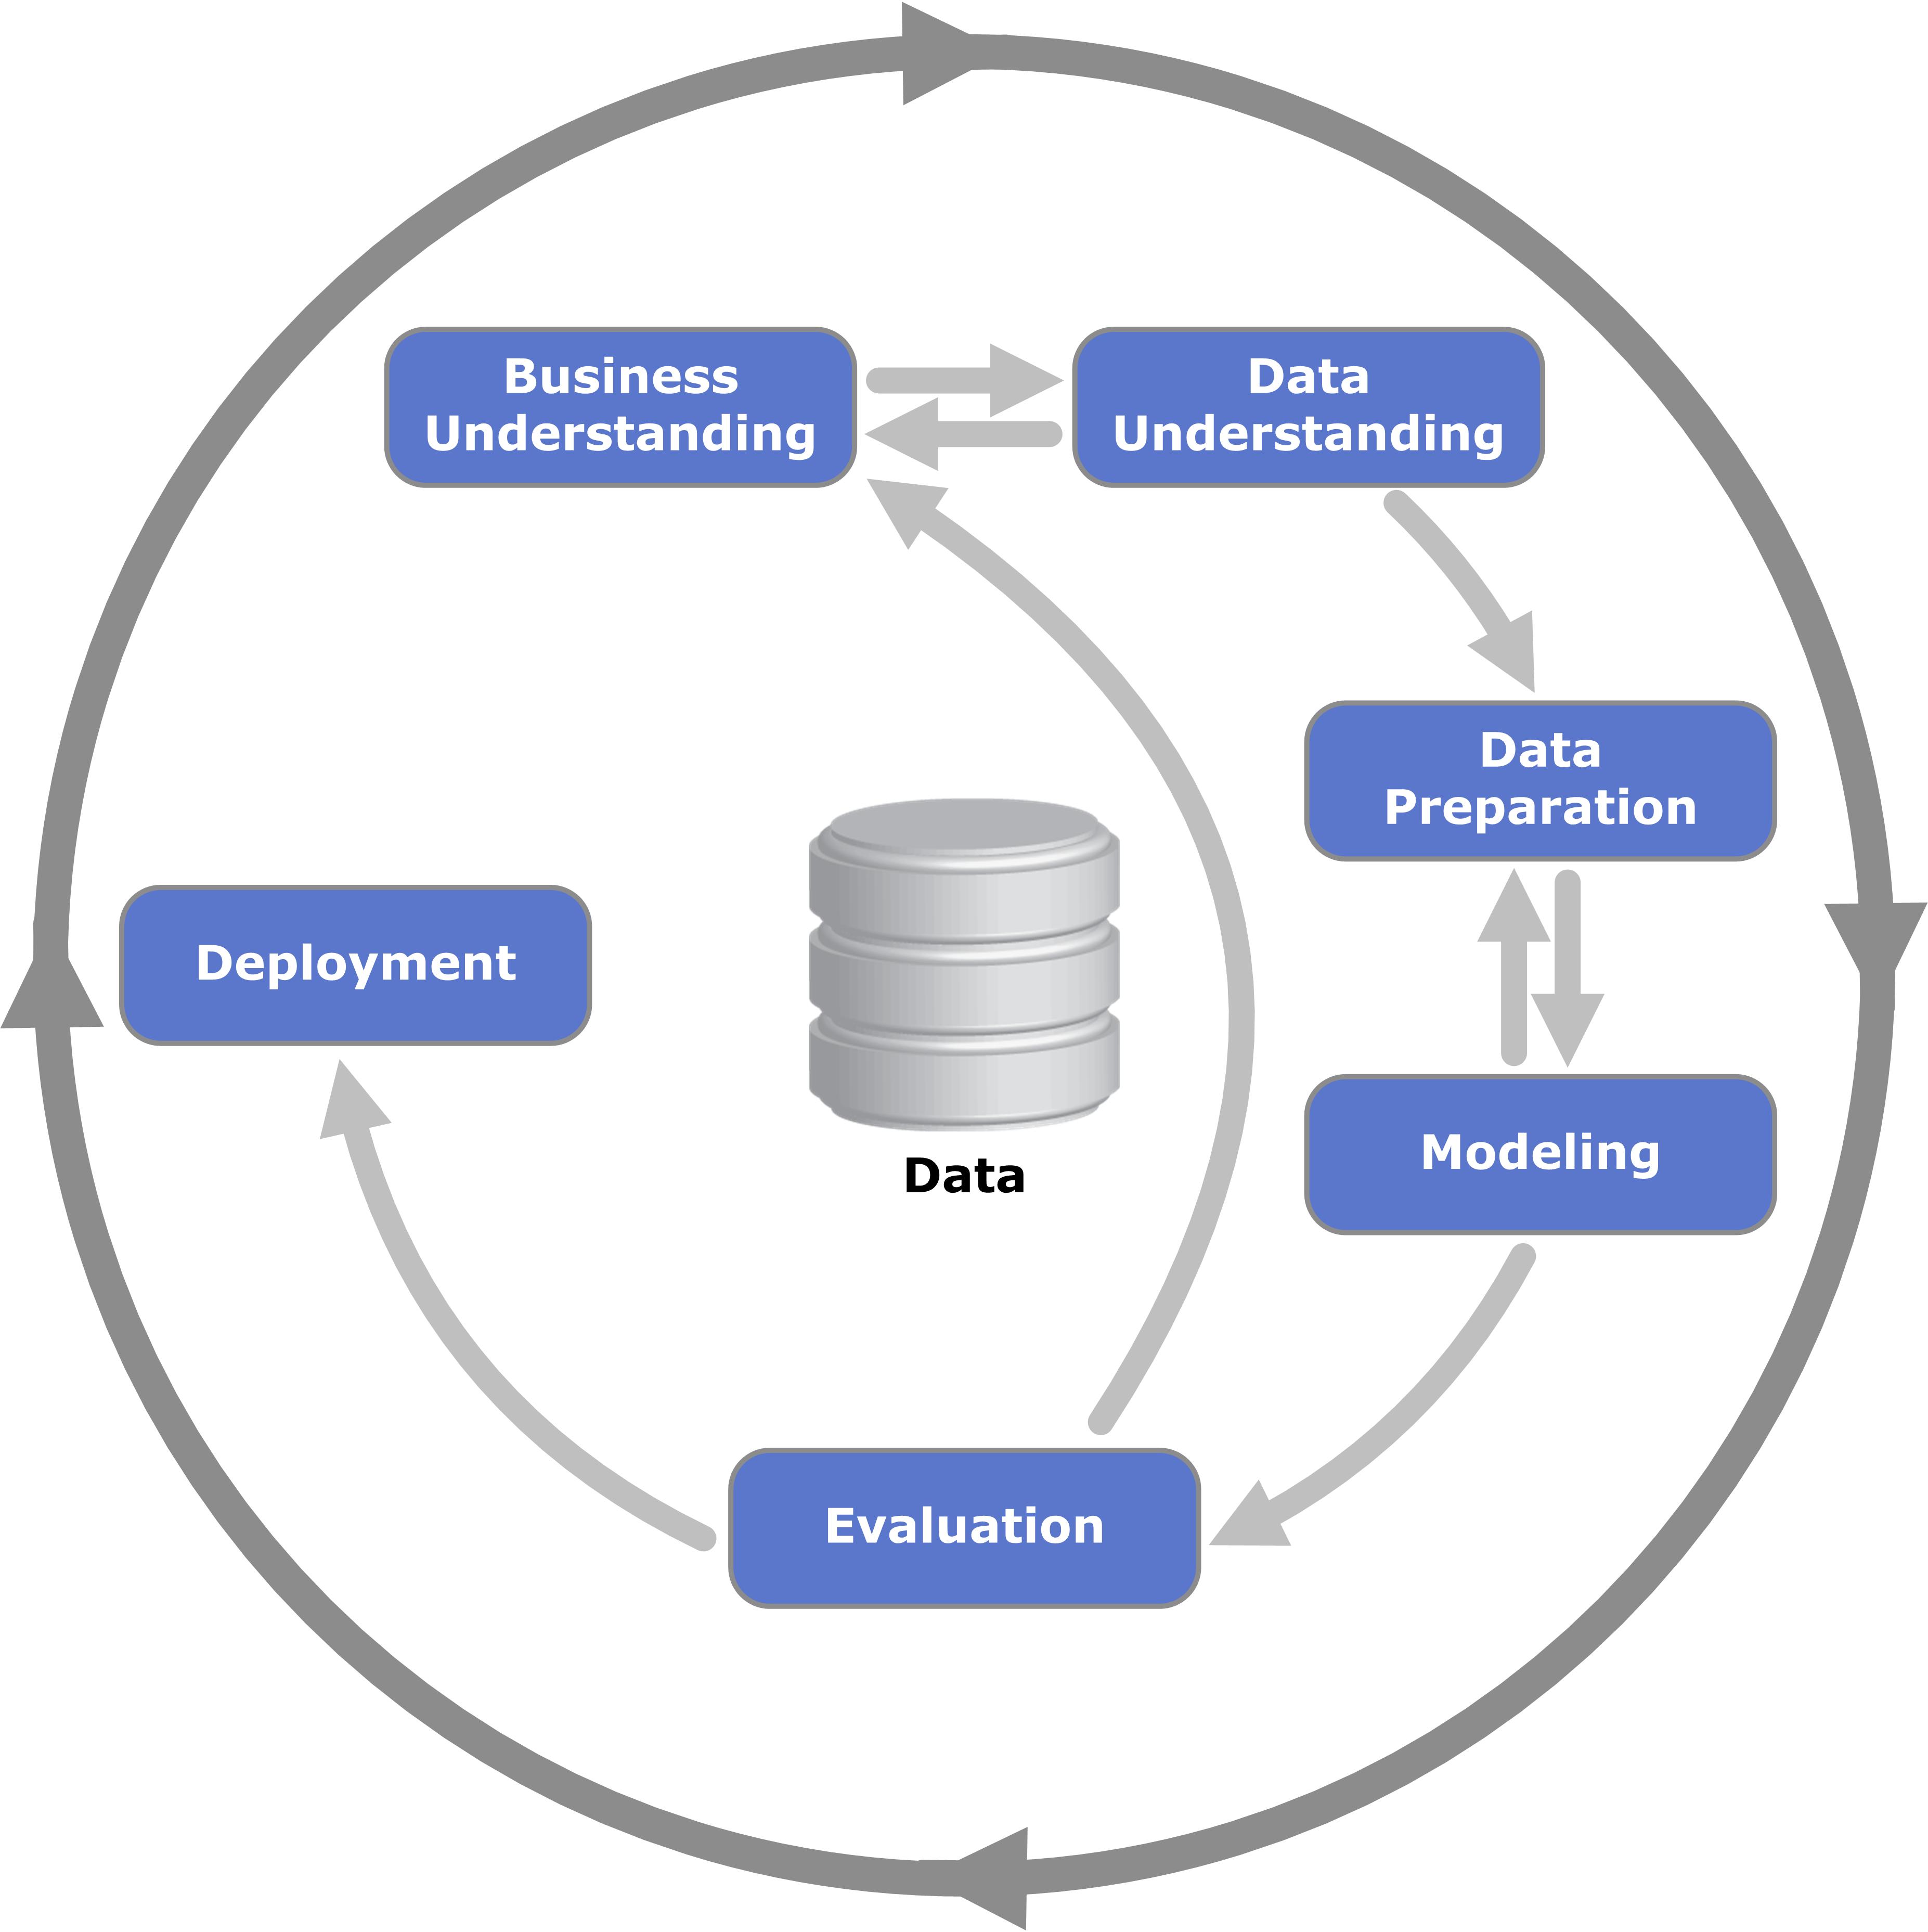 CRISP-DM Process